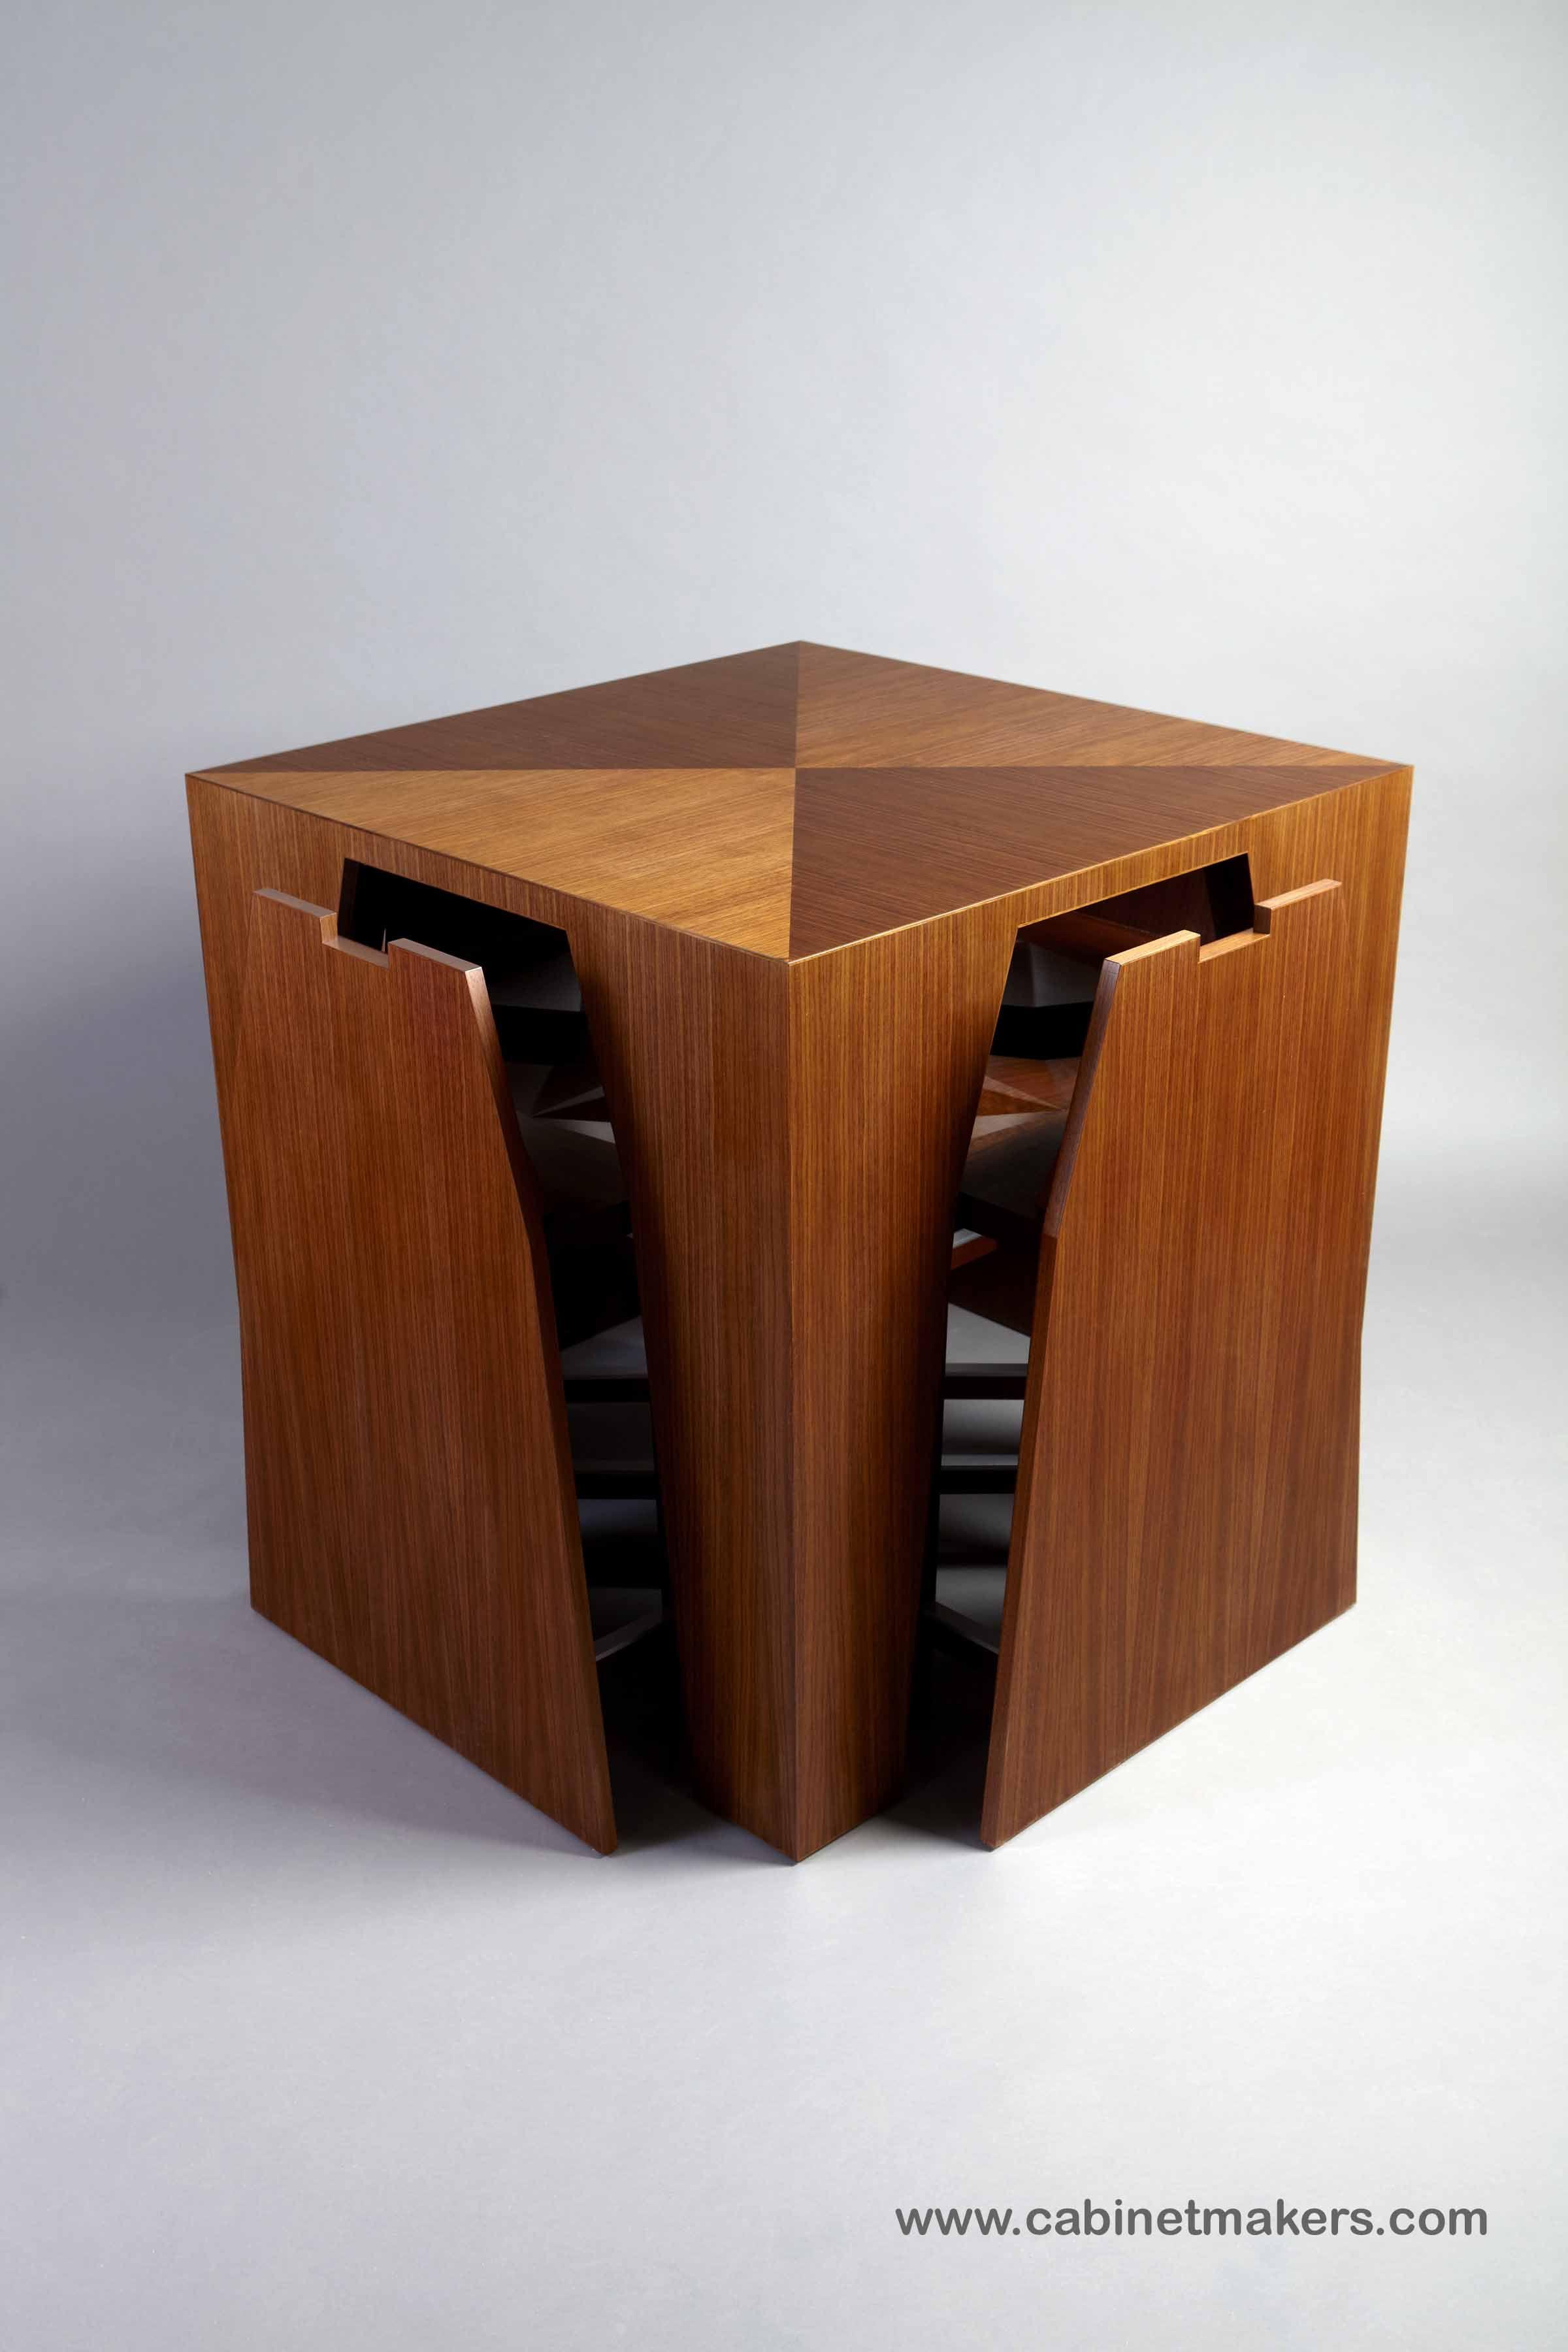 The Cube Designed By Paul Reidt For Kr H S Hidden Kitchen Series